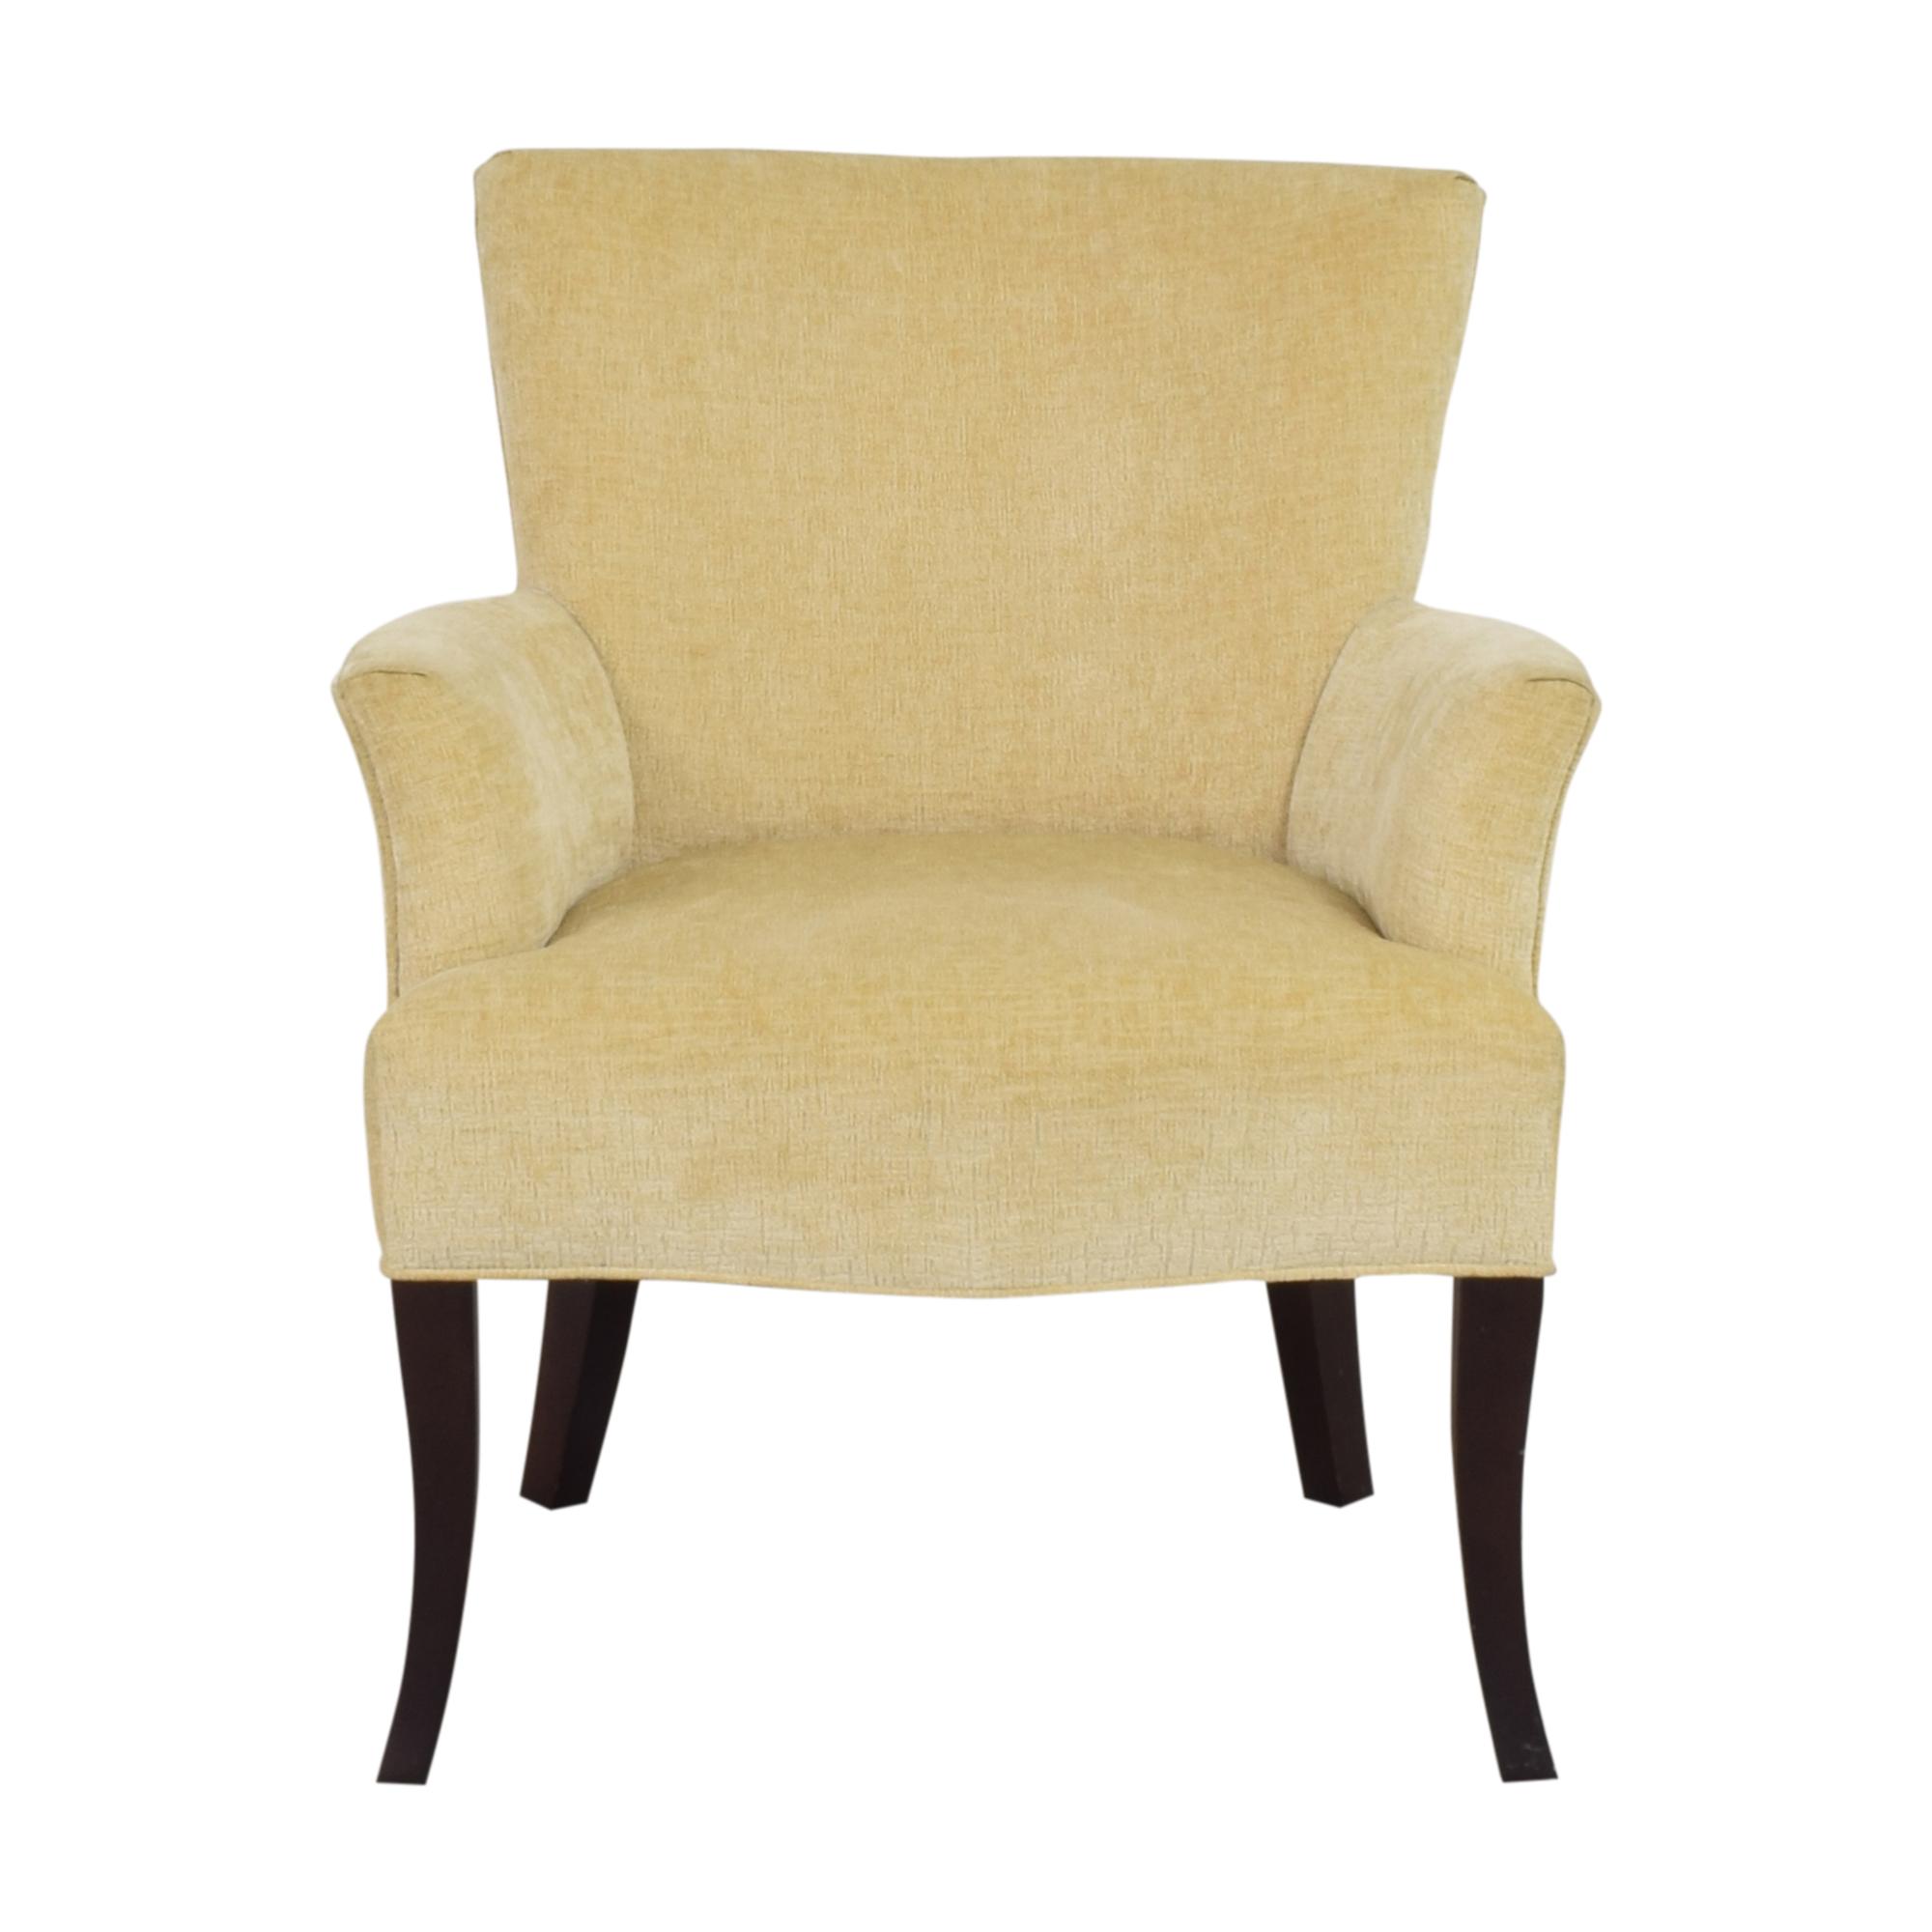 buy Crate & Barrel Crate & Barrel Accent Arm Chair online